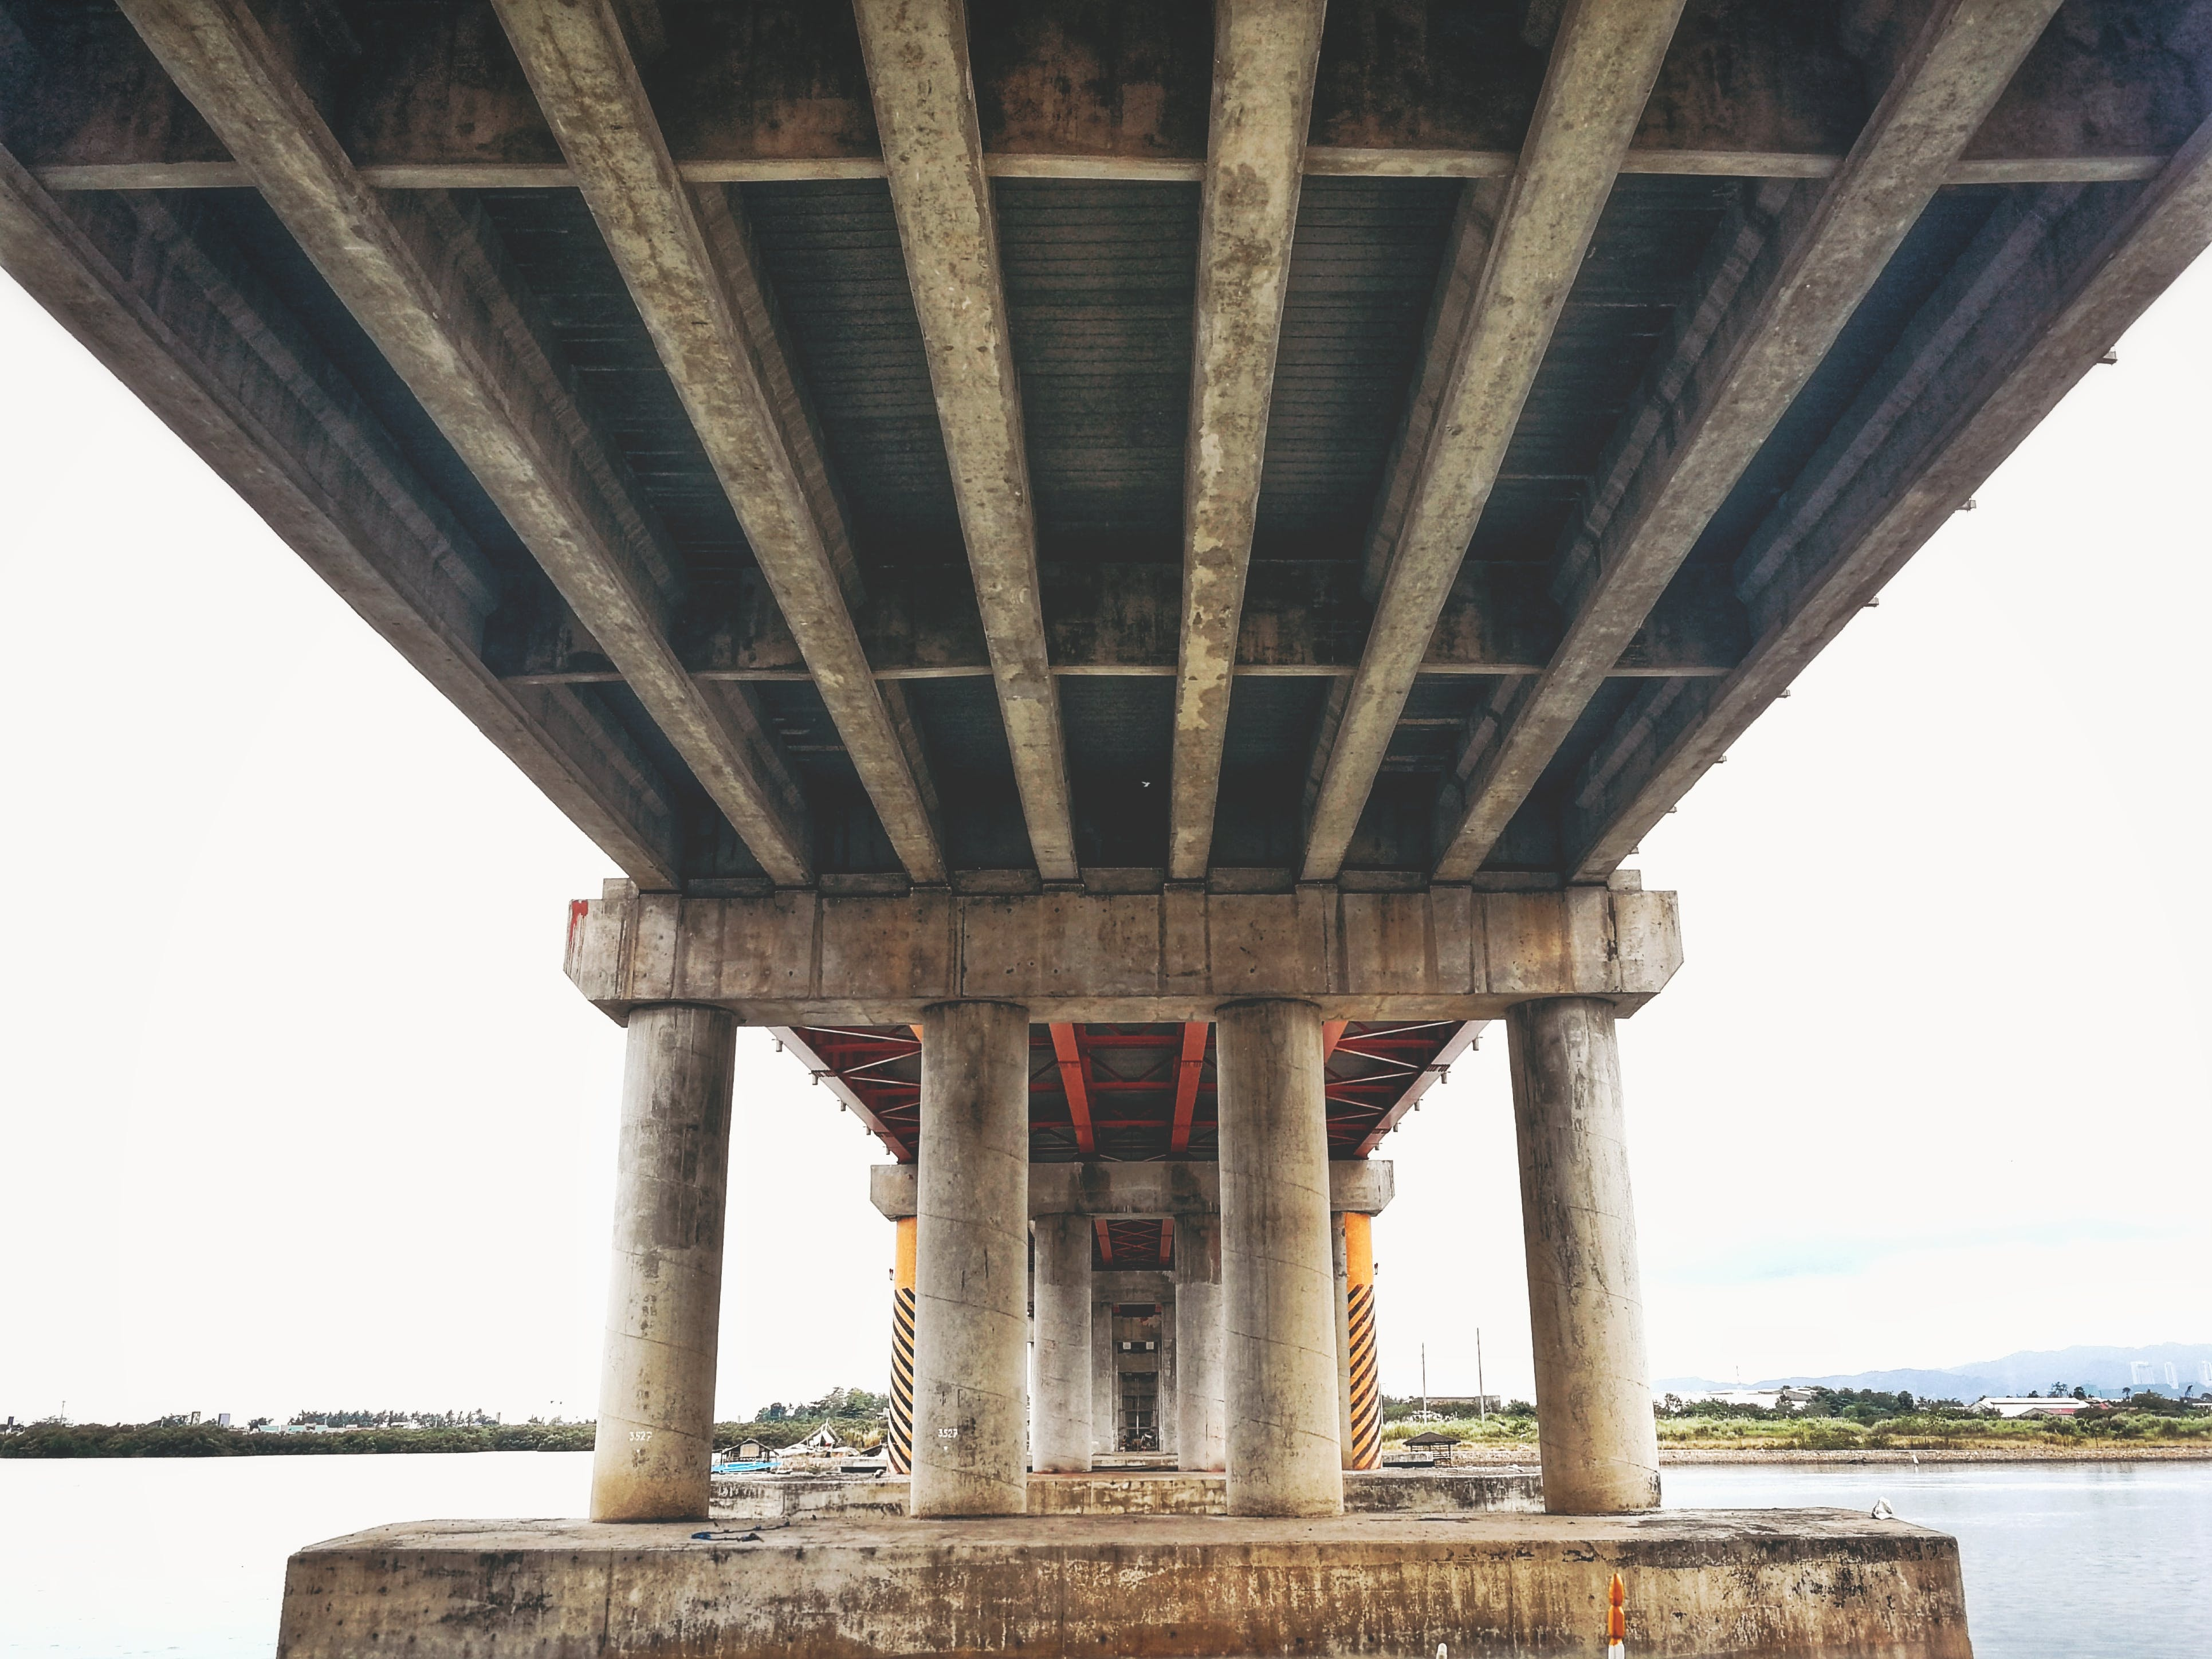 Free stock photo of construction, bridge, work, symmetrical